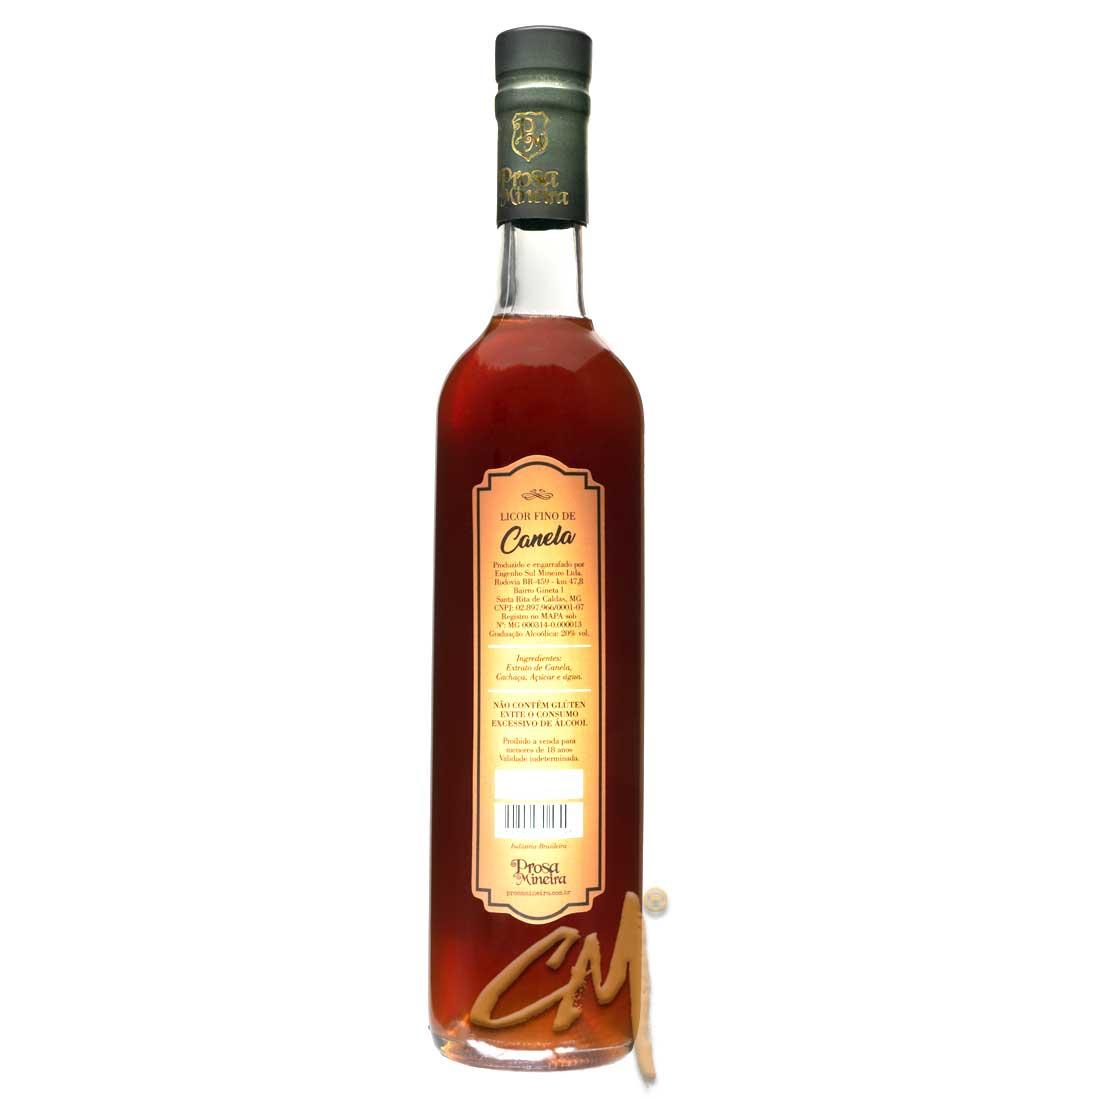 Licor de Canela - Prosa Mineira 500 ml (Sta Rita de Caldas - MG)